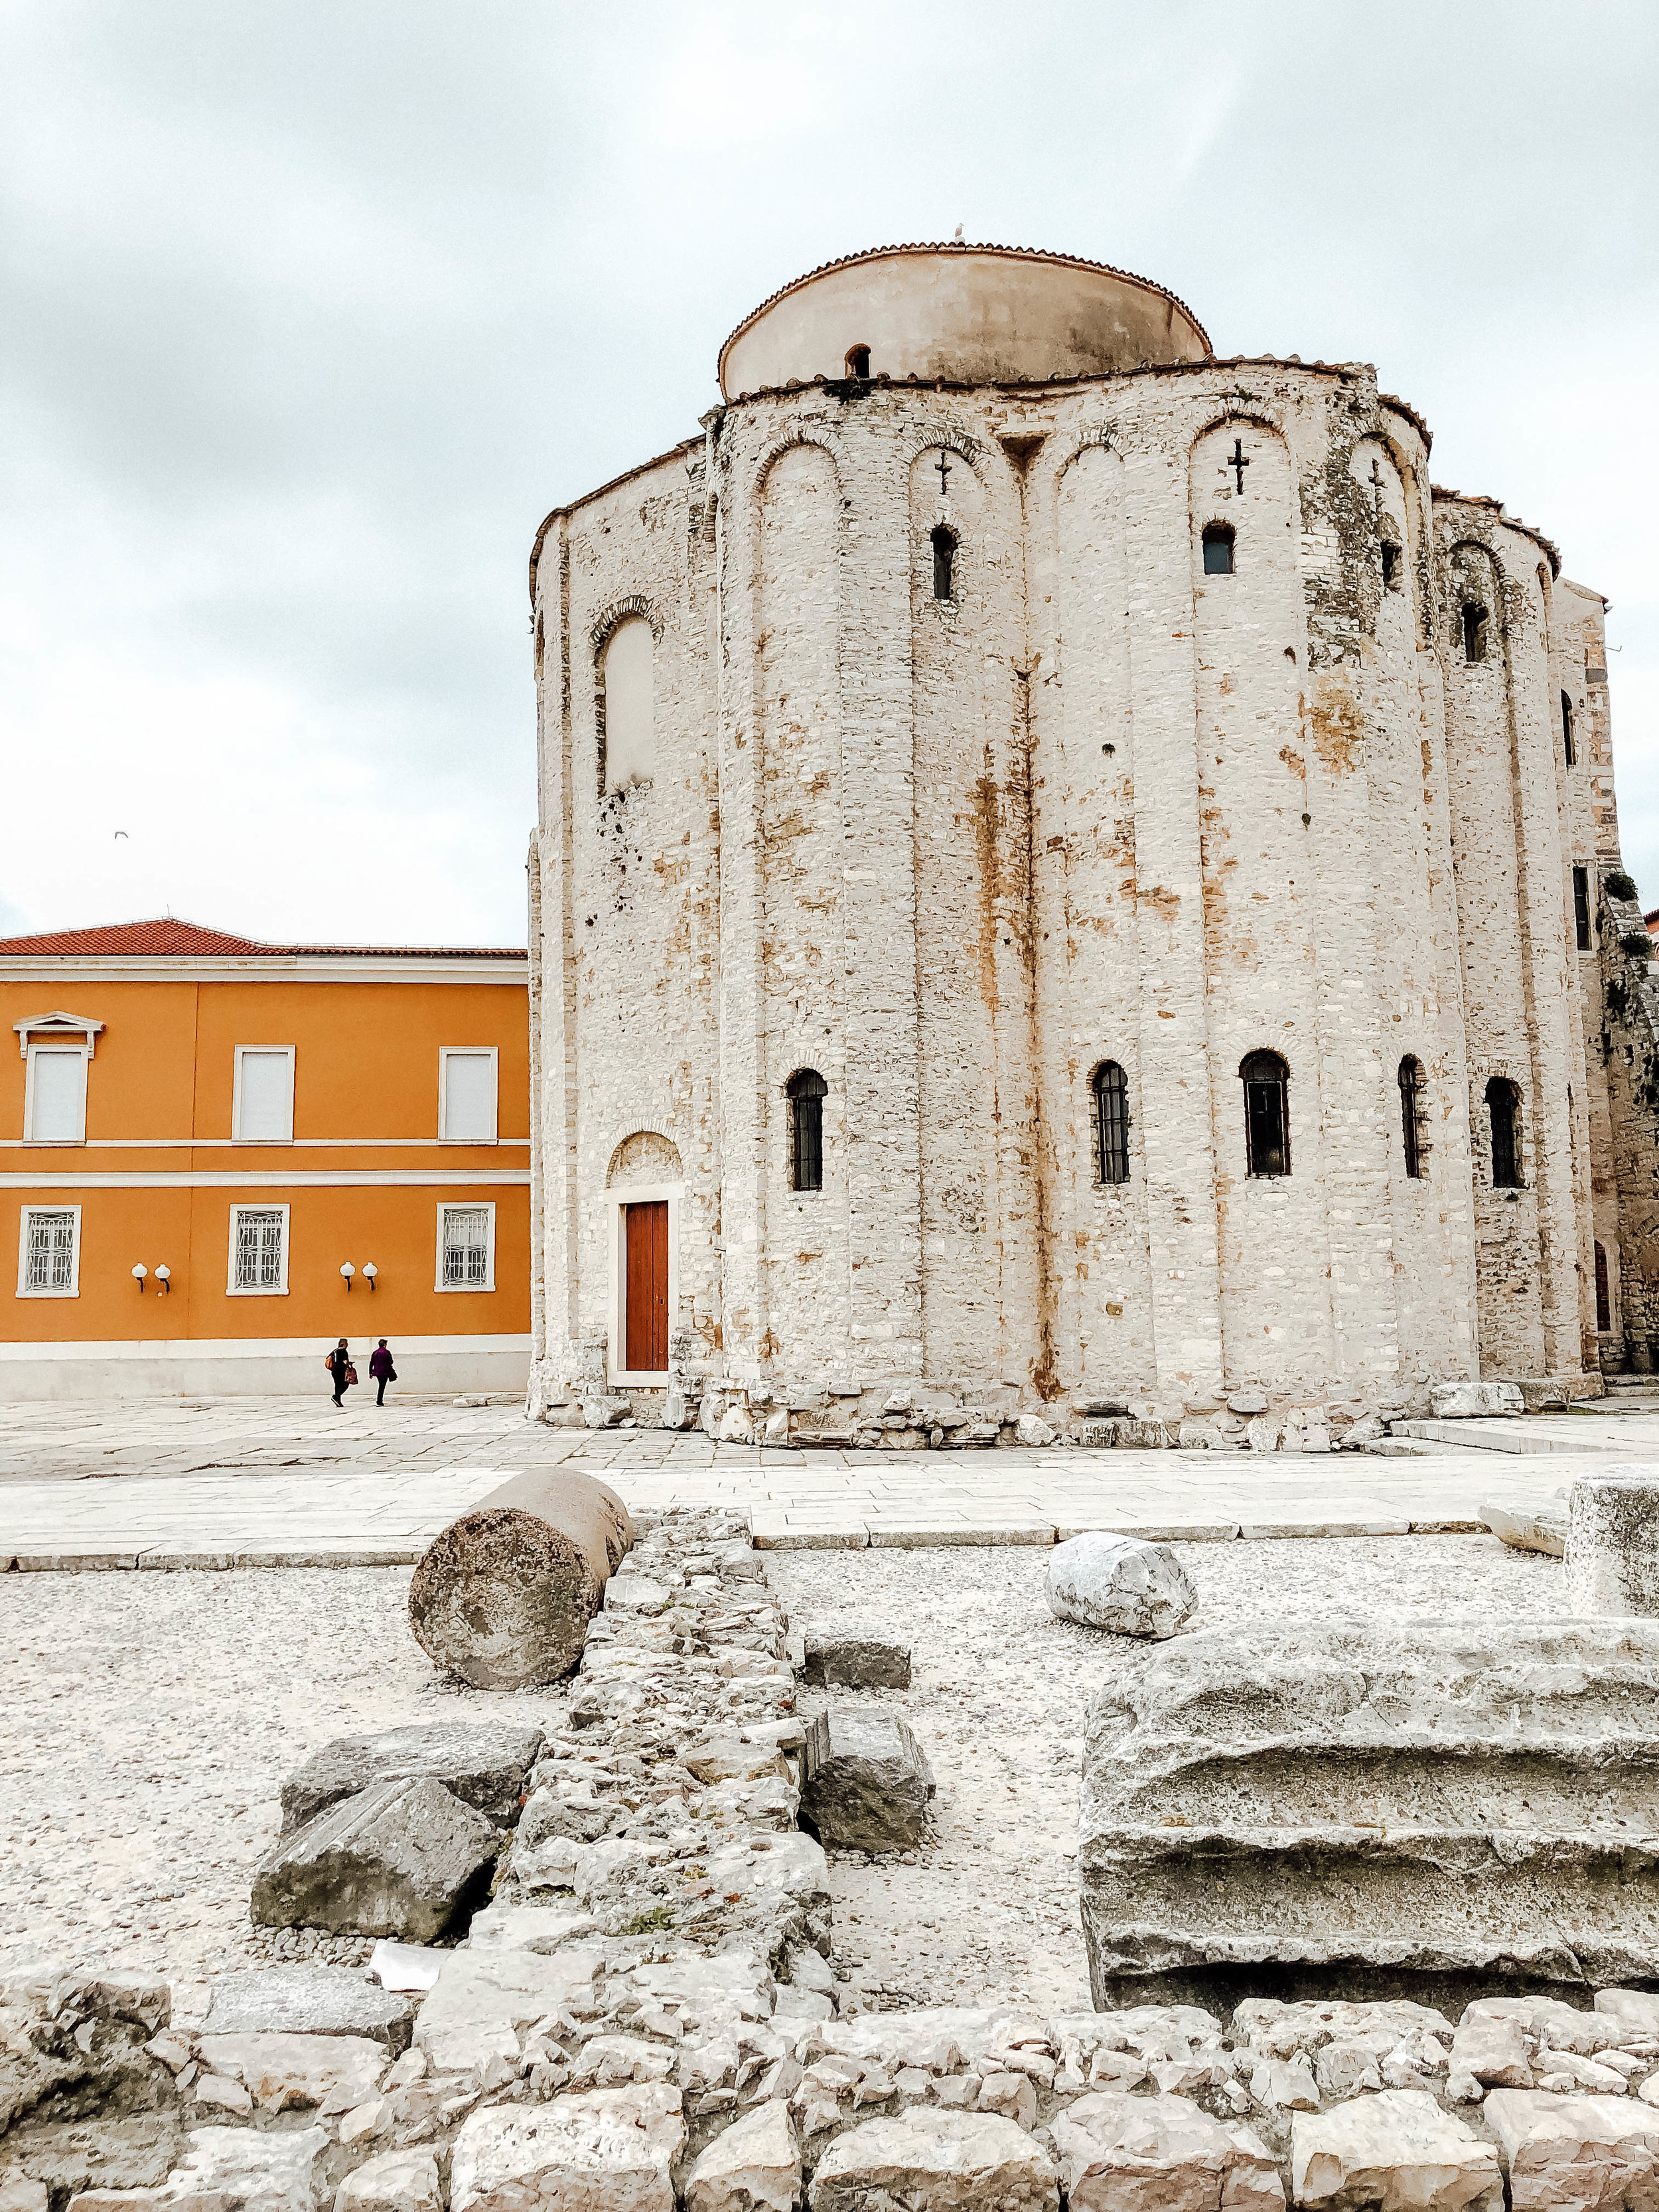 Roman ruins in Zadar, Croatia